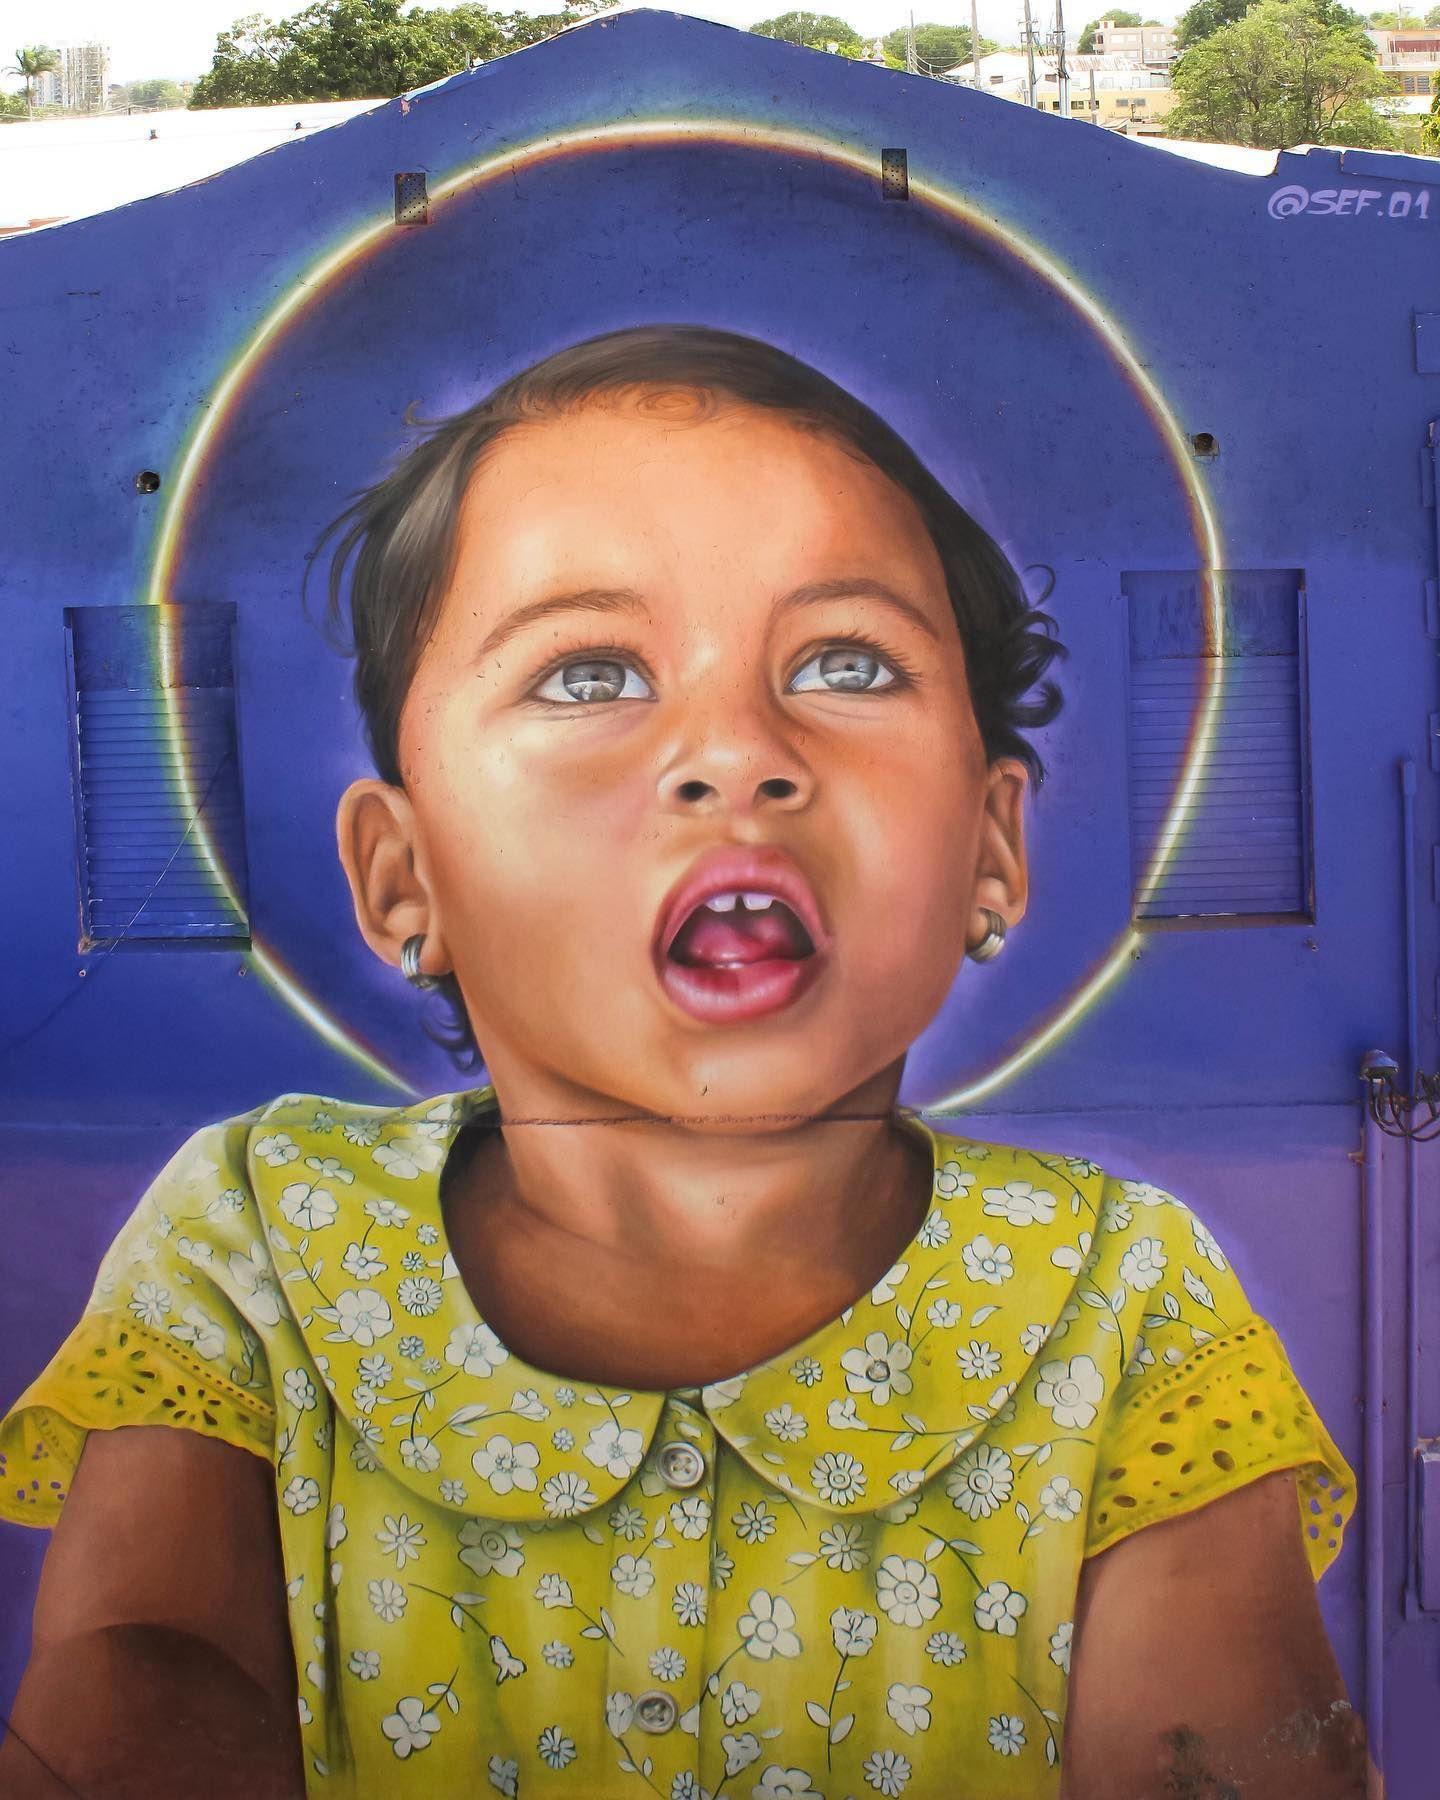 Sef 01 In Yauco Puerto Rico 2019 Strassenkunstler Urbane Kunst Kunstproduktion